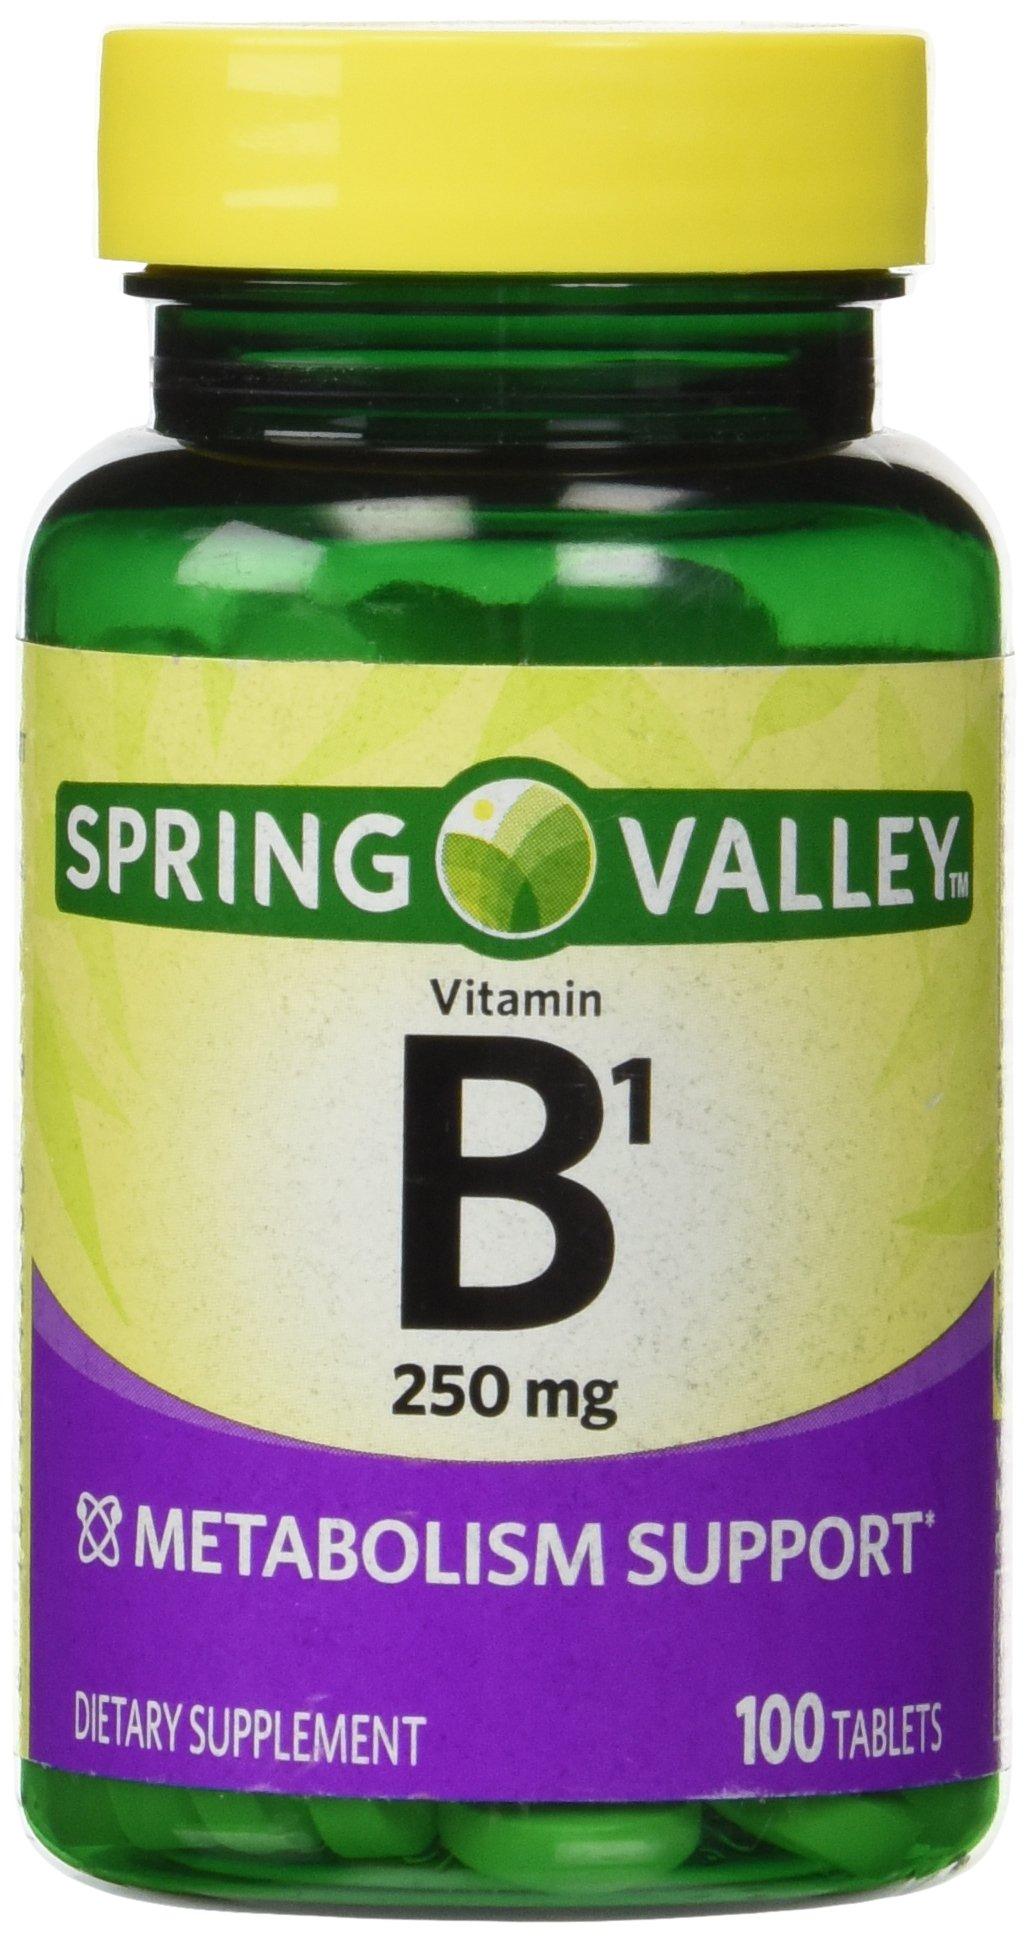 Spring Valley Natural Metabolism Support B1, 100 tablets